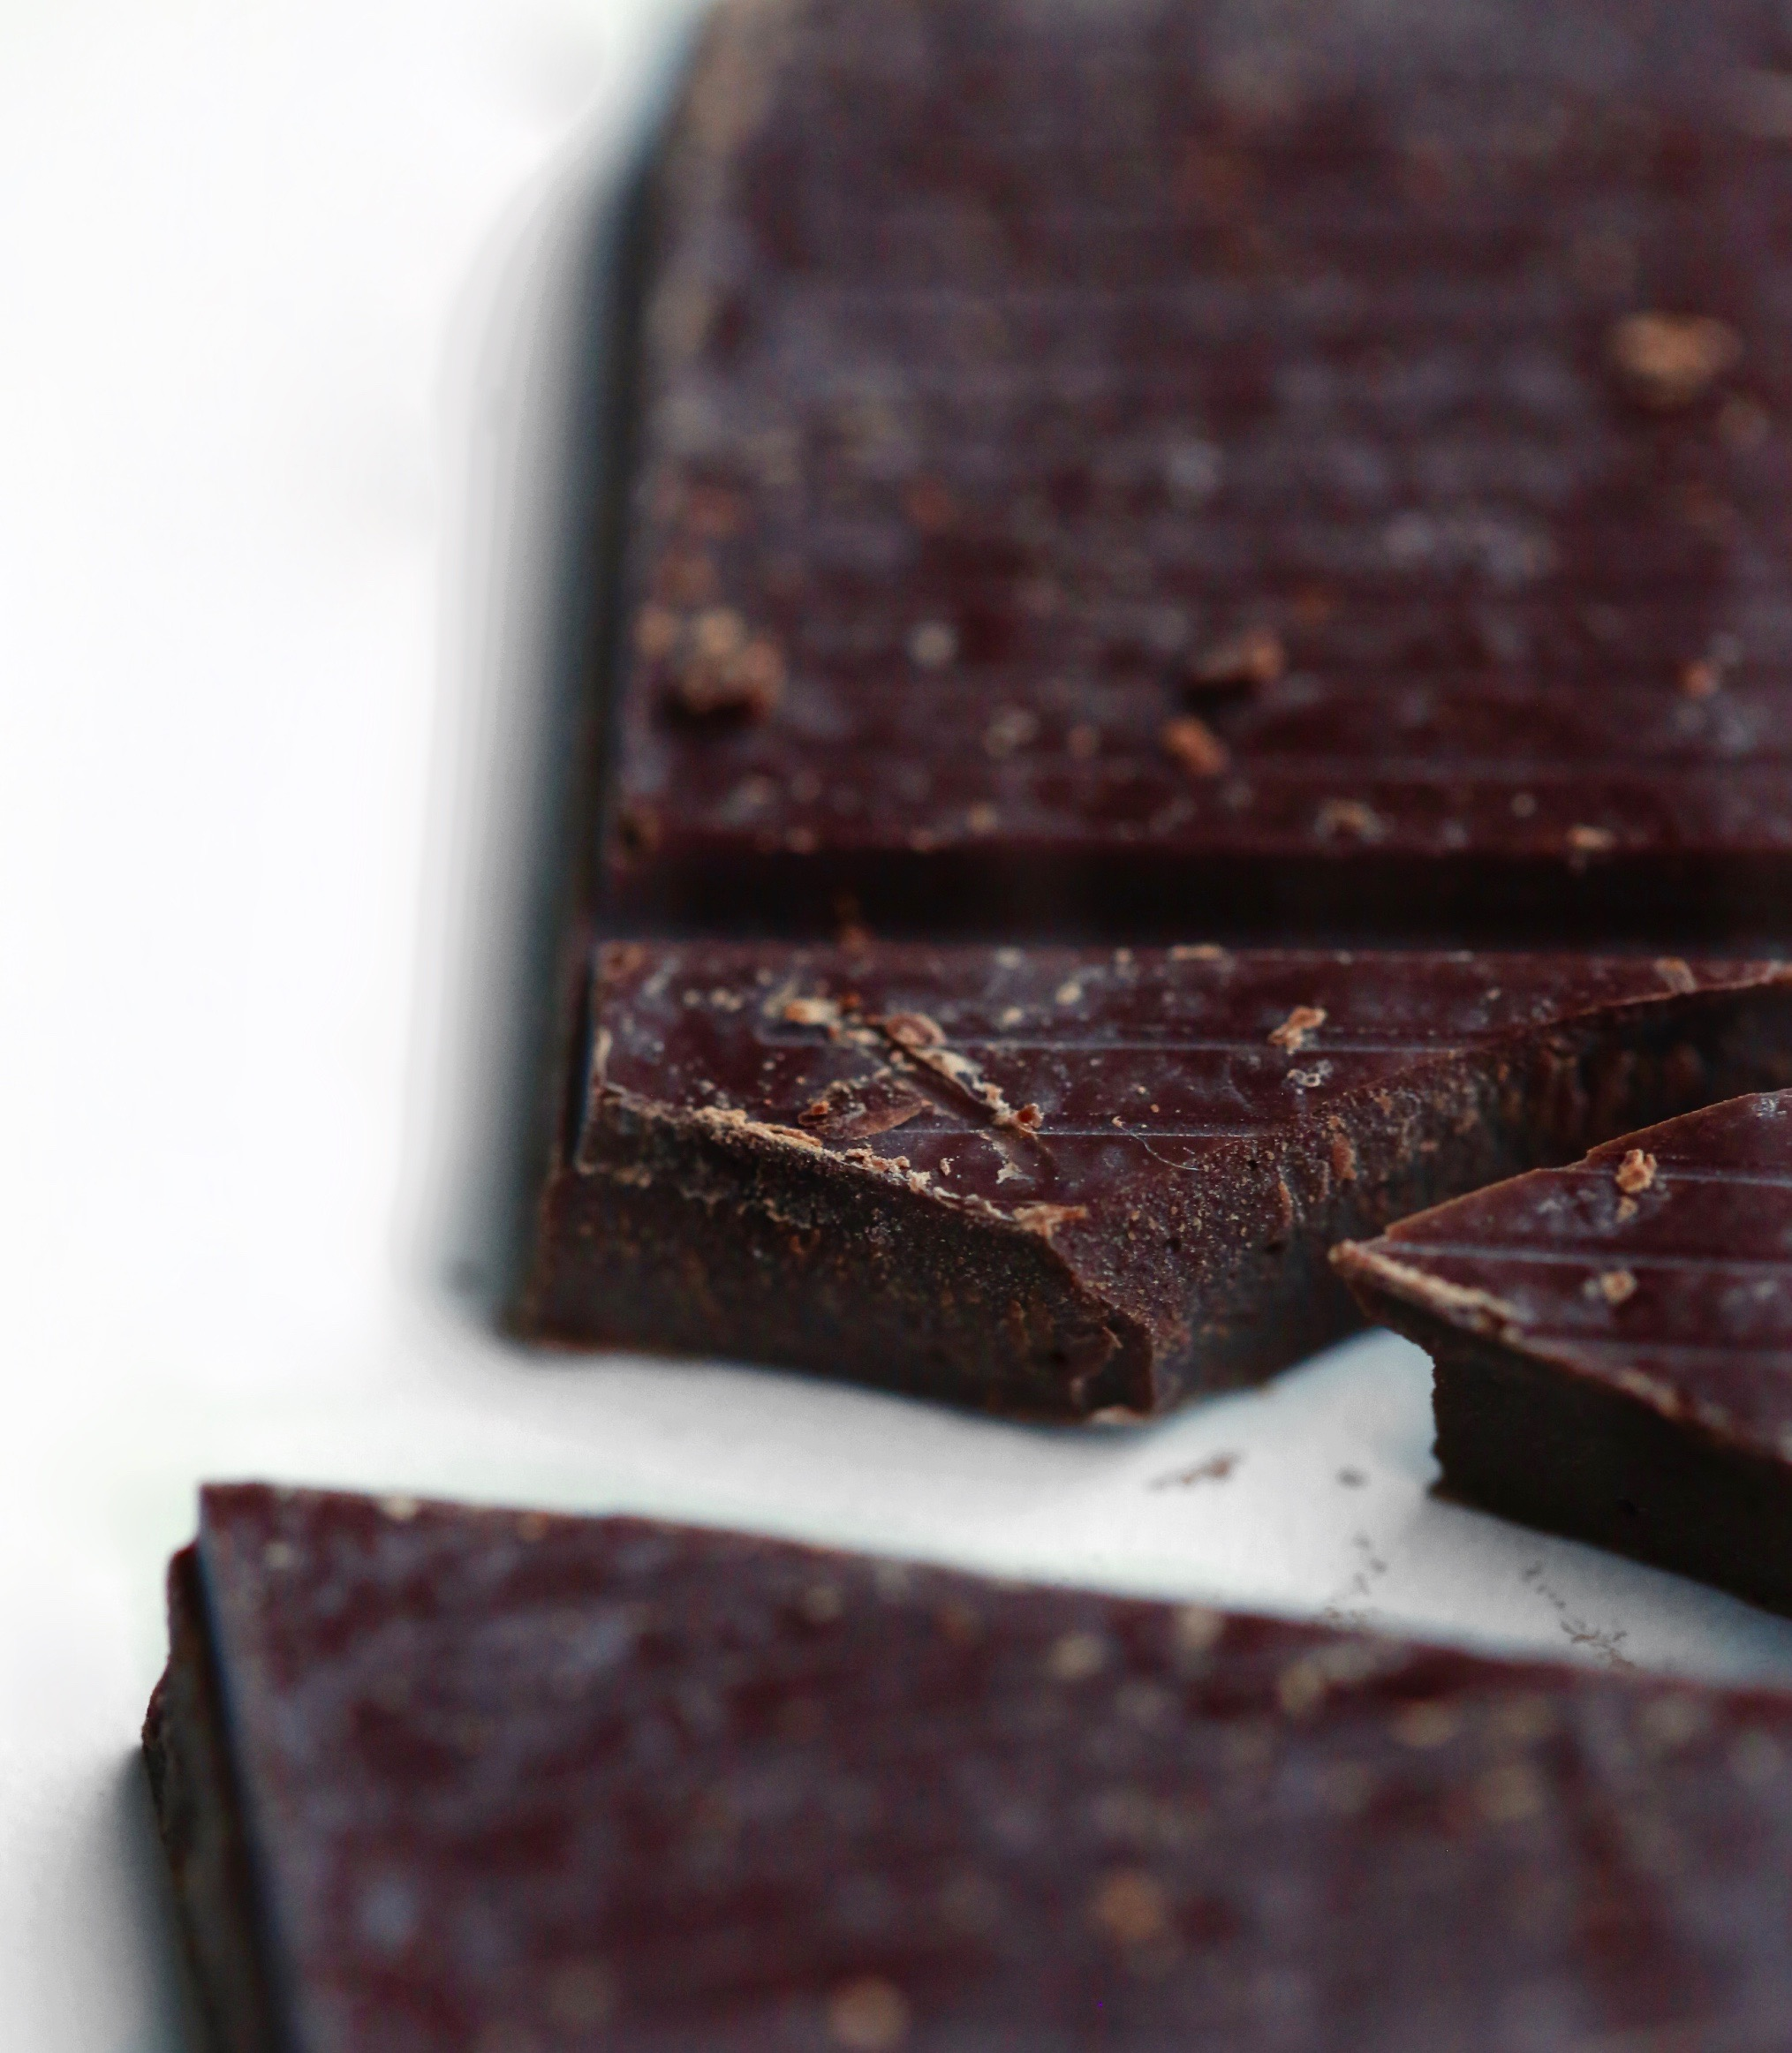 12-plader-chokolade-senere-10-opskrifter-med-chokolade-1